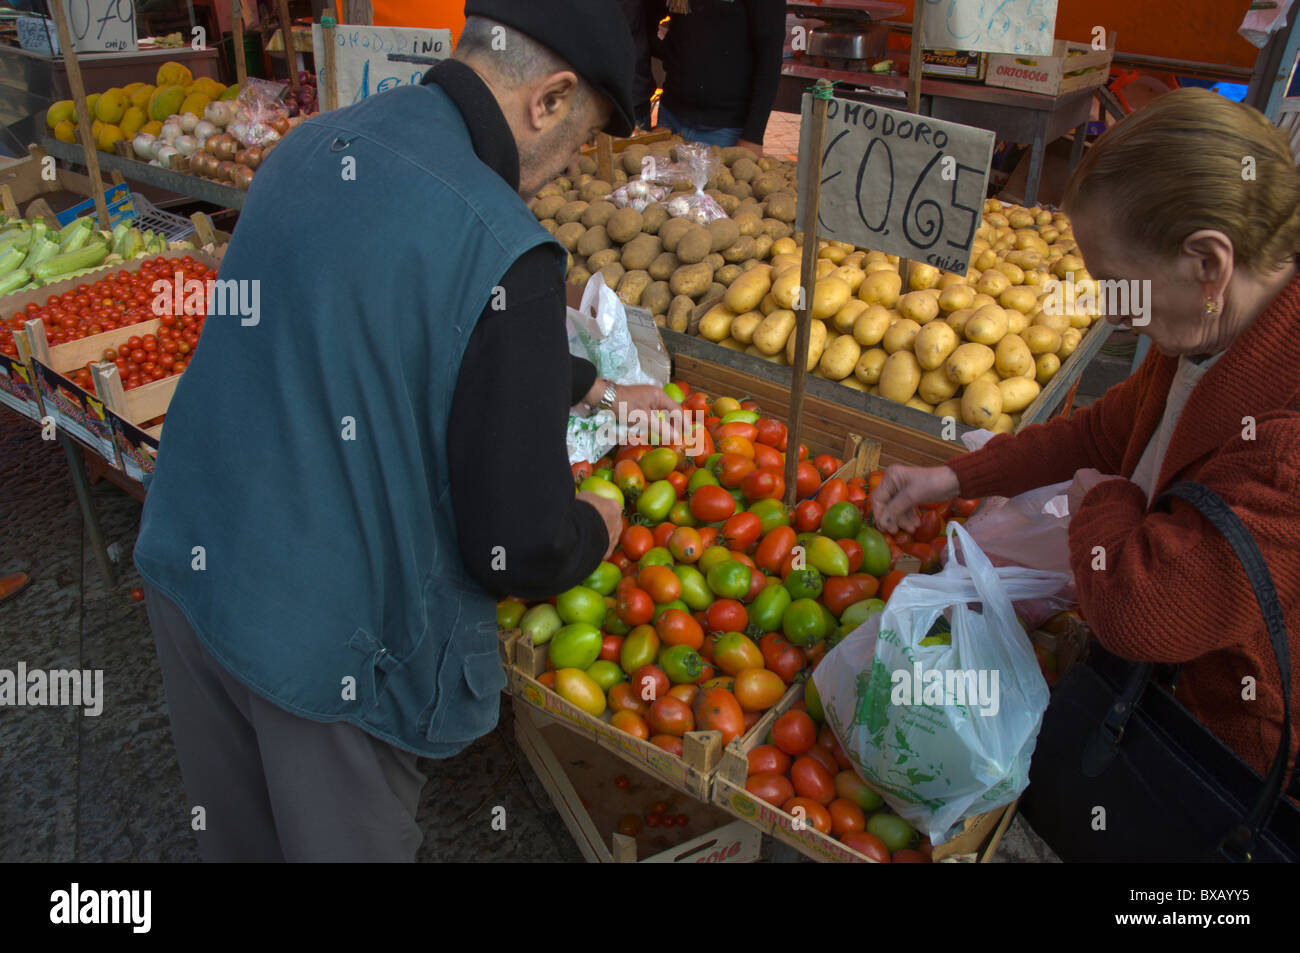 People selecting tomatoes Mercato di Ballaro market Albergheria district central Palermo Sicily Italy Europe - Stock Image